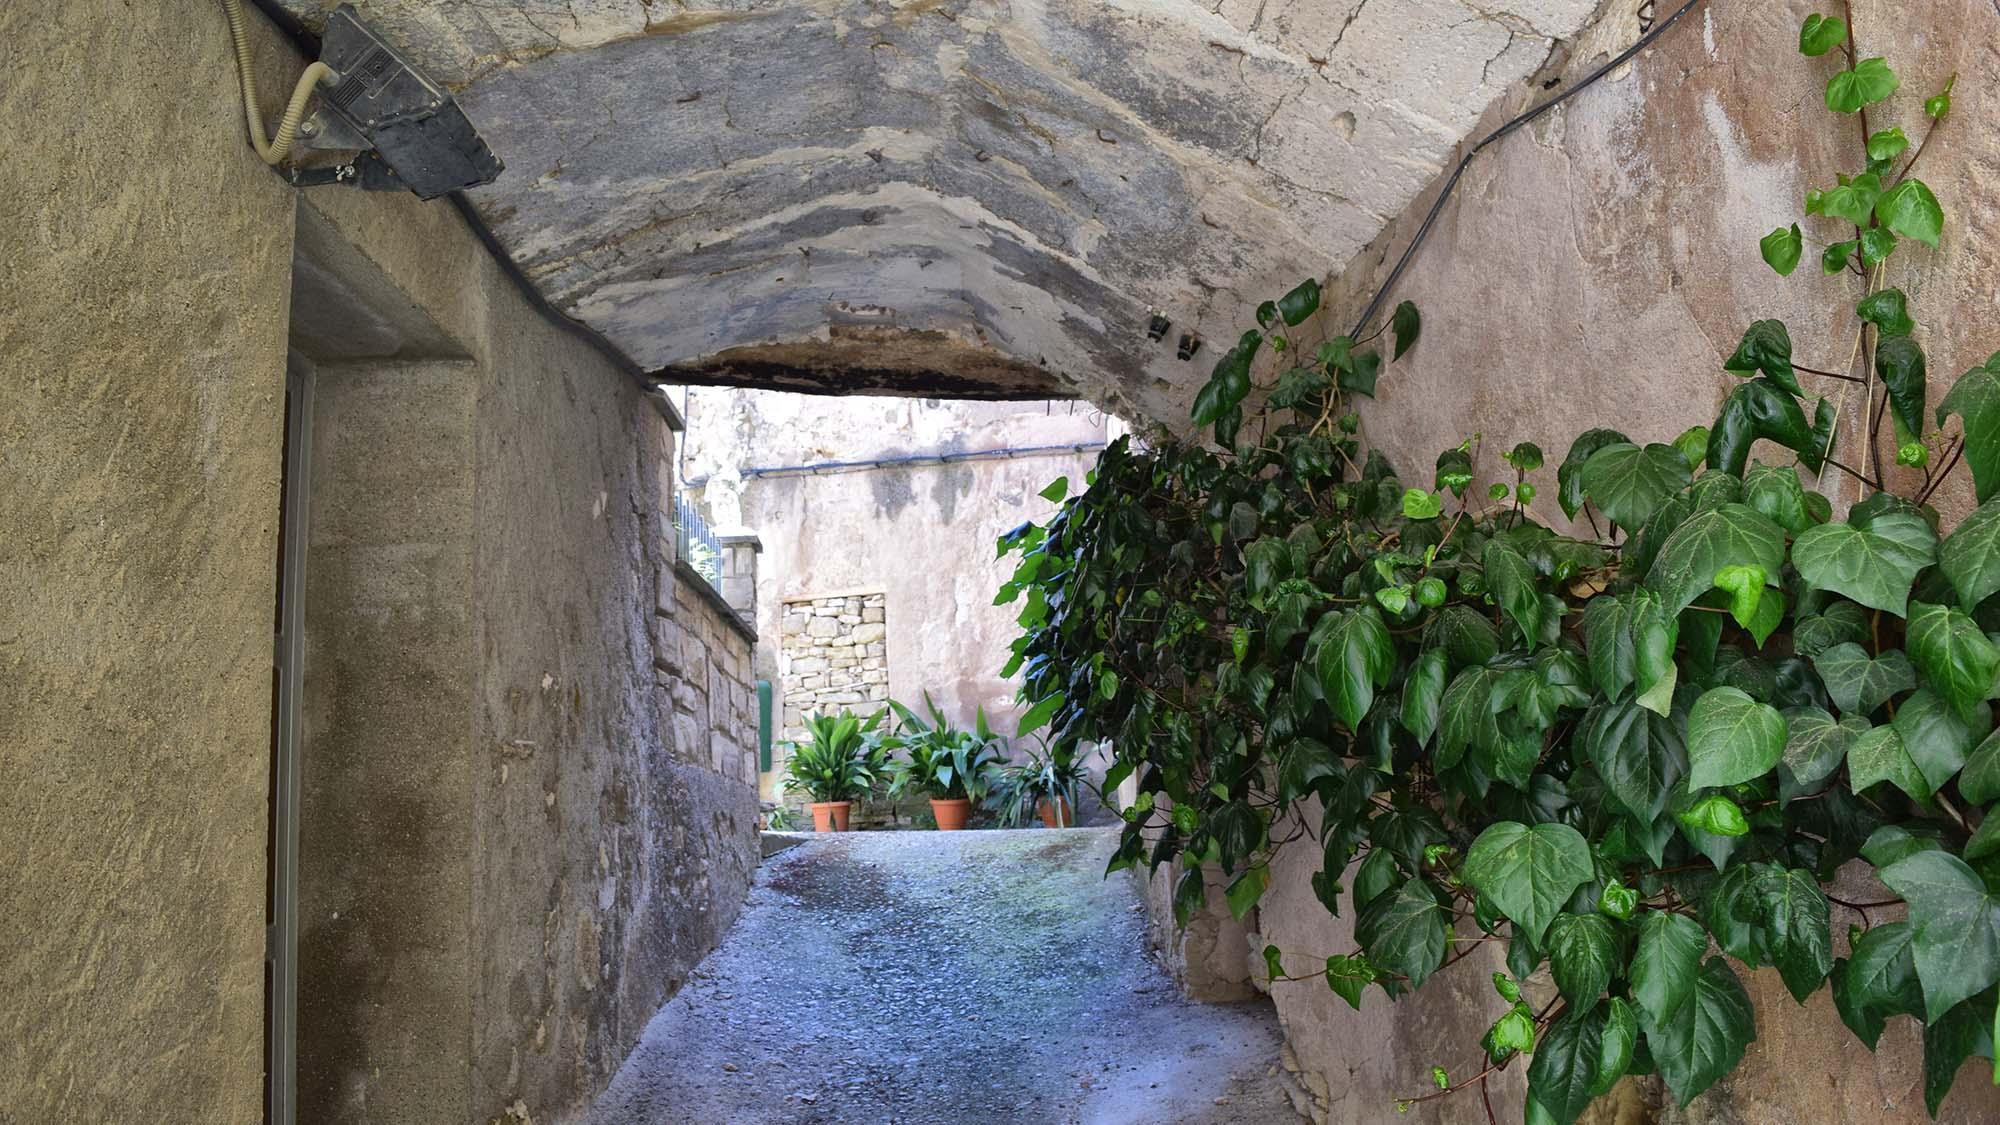 Vieille ville  Portals i carrers